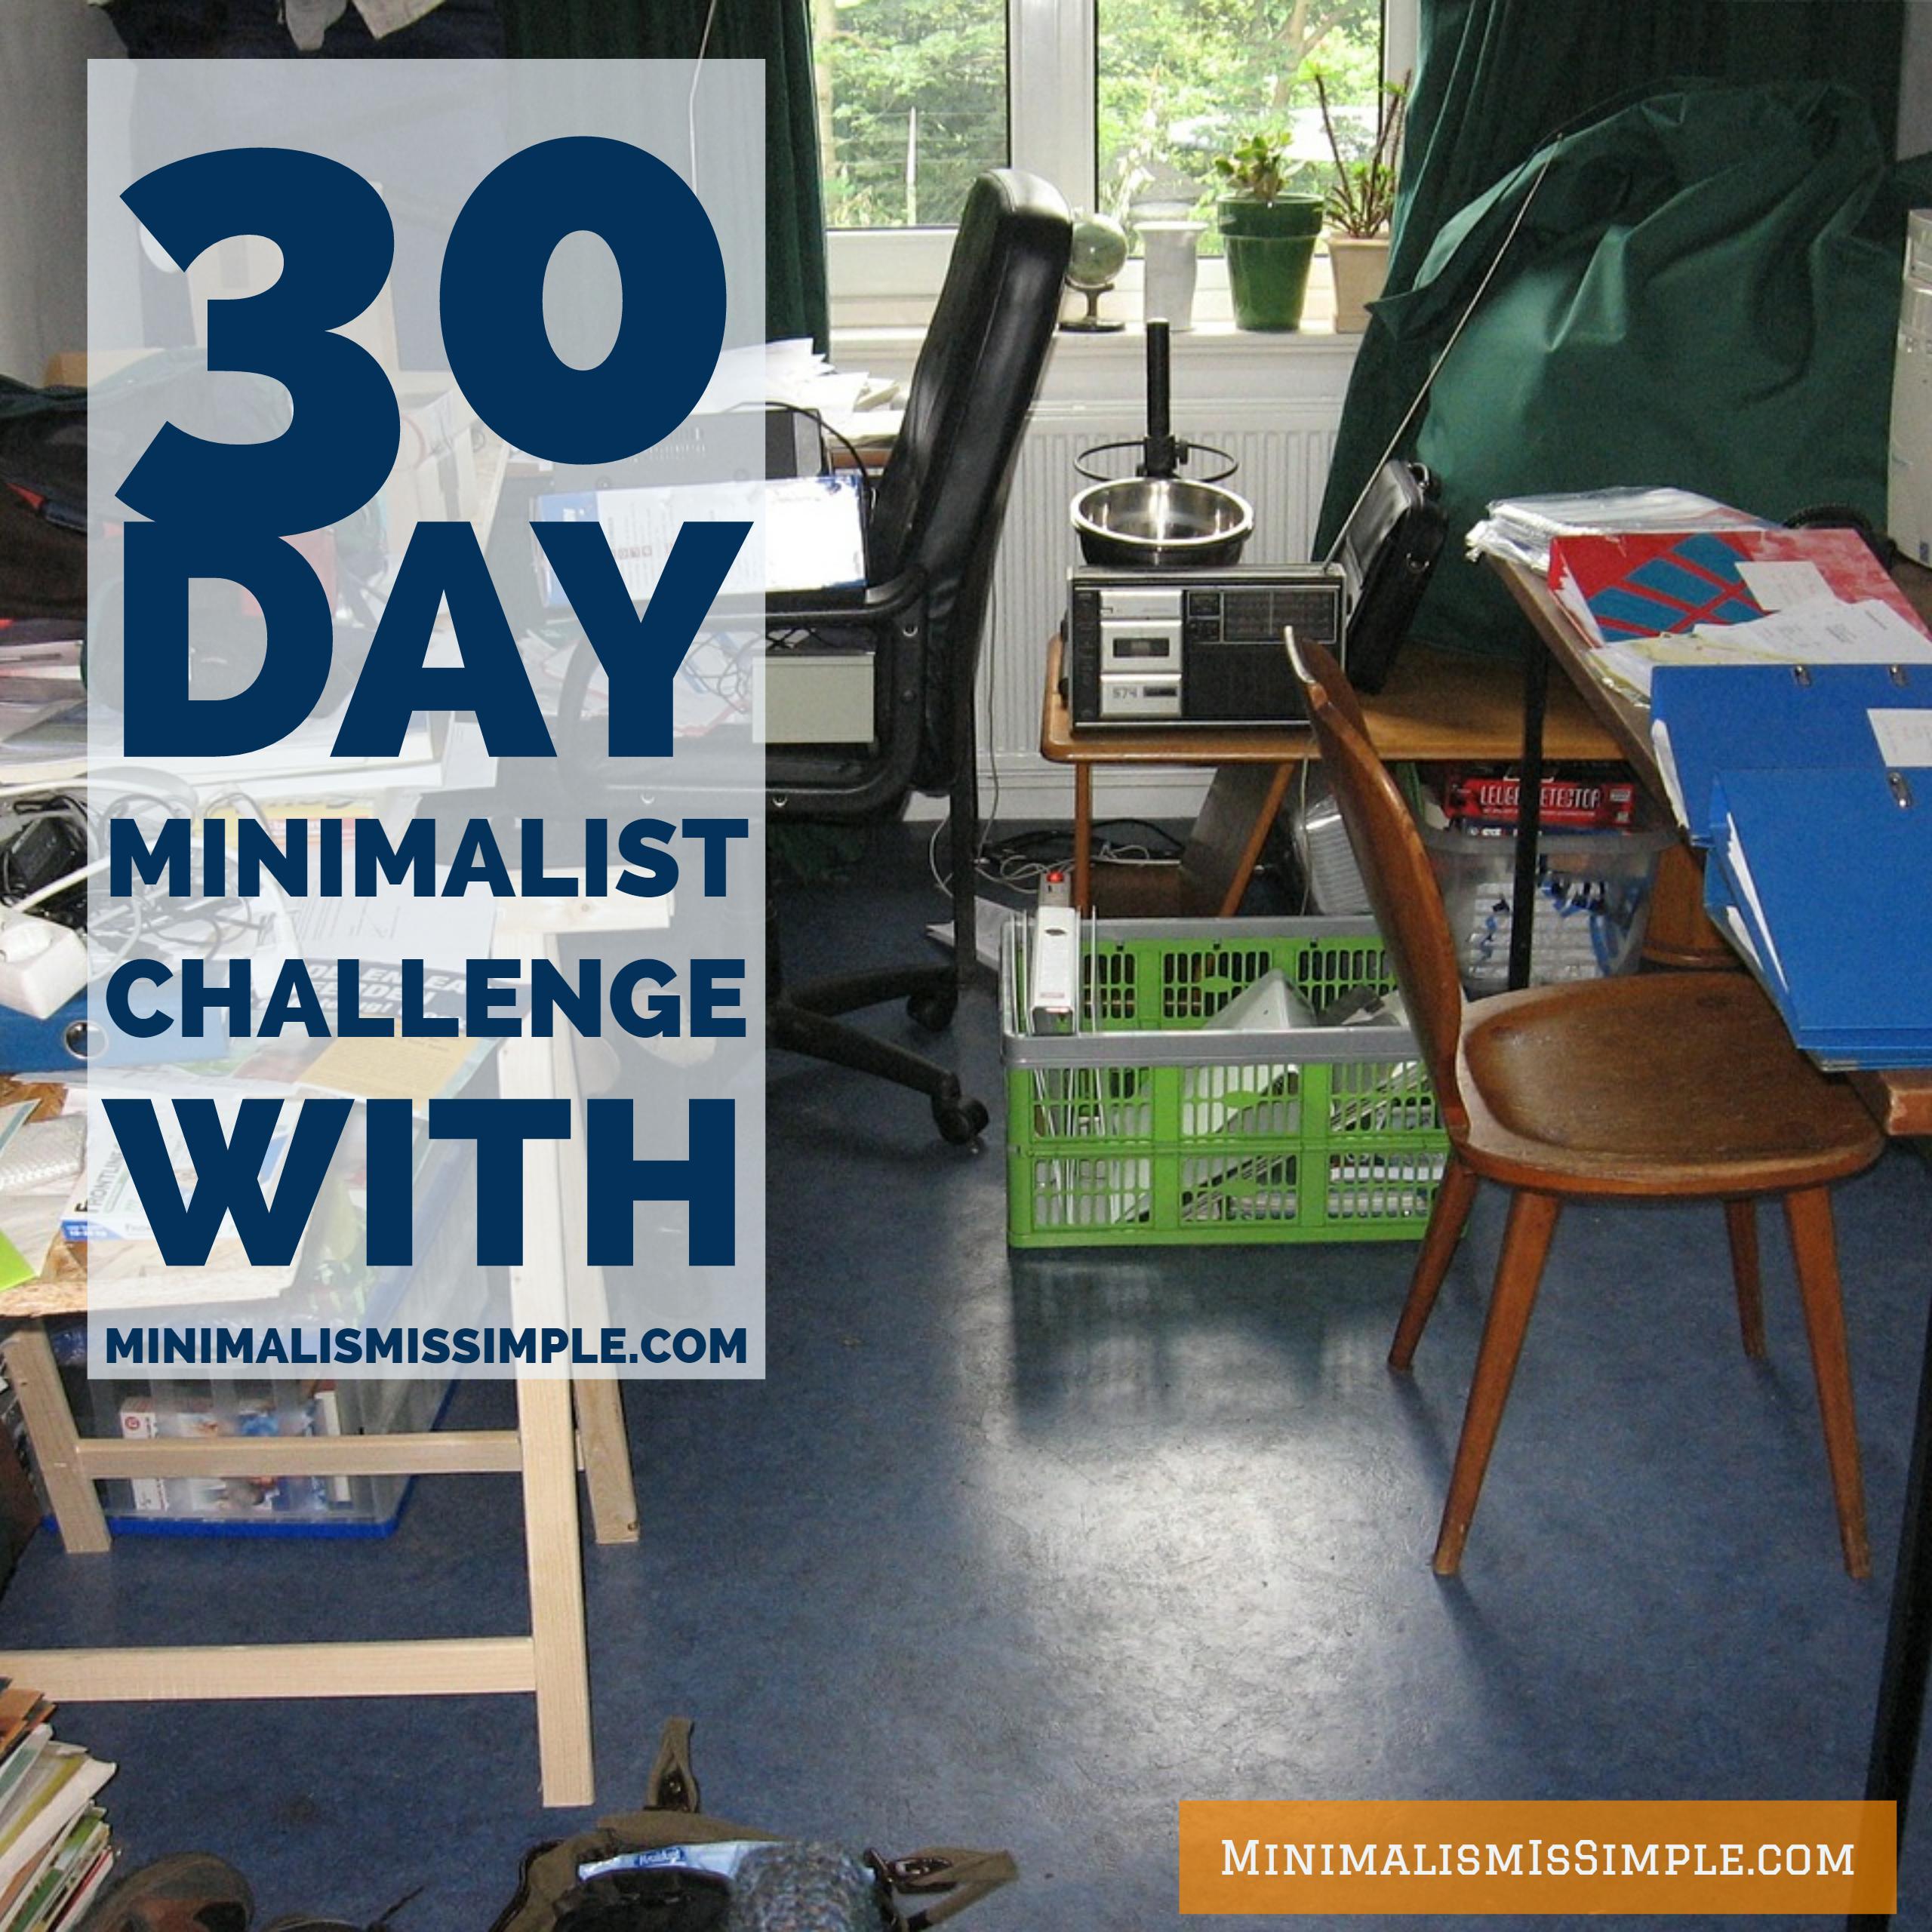 30 day challenge with minimalismissimple